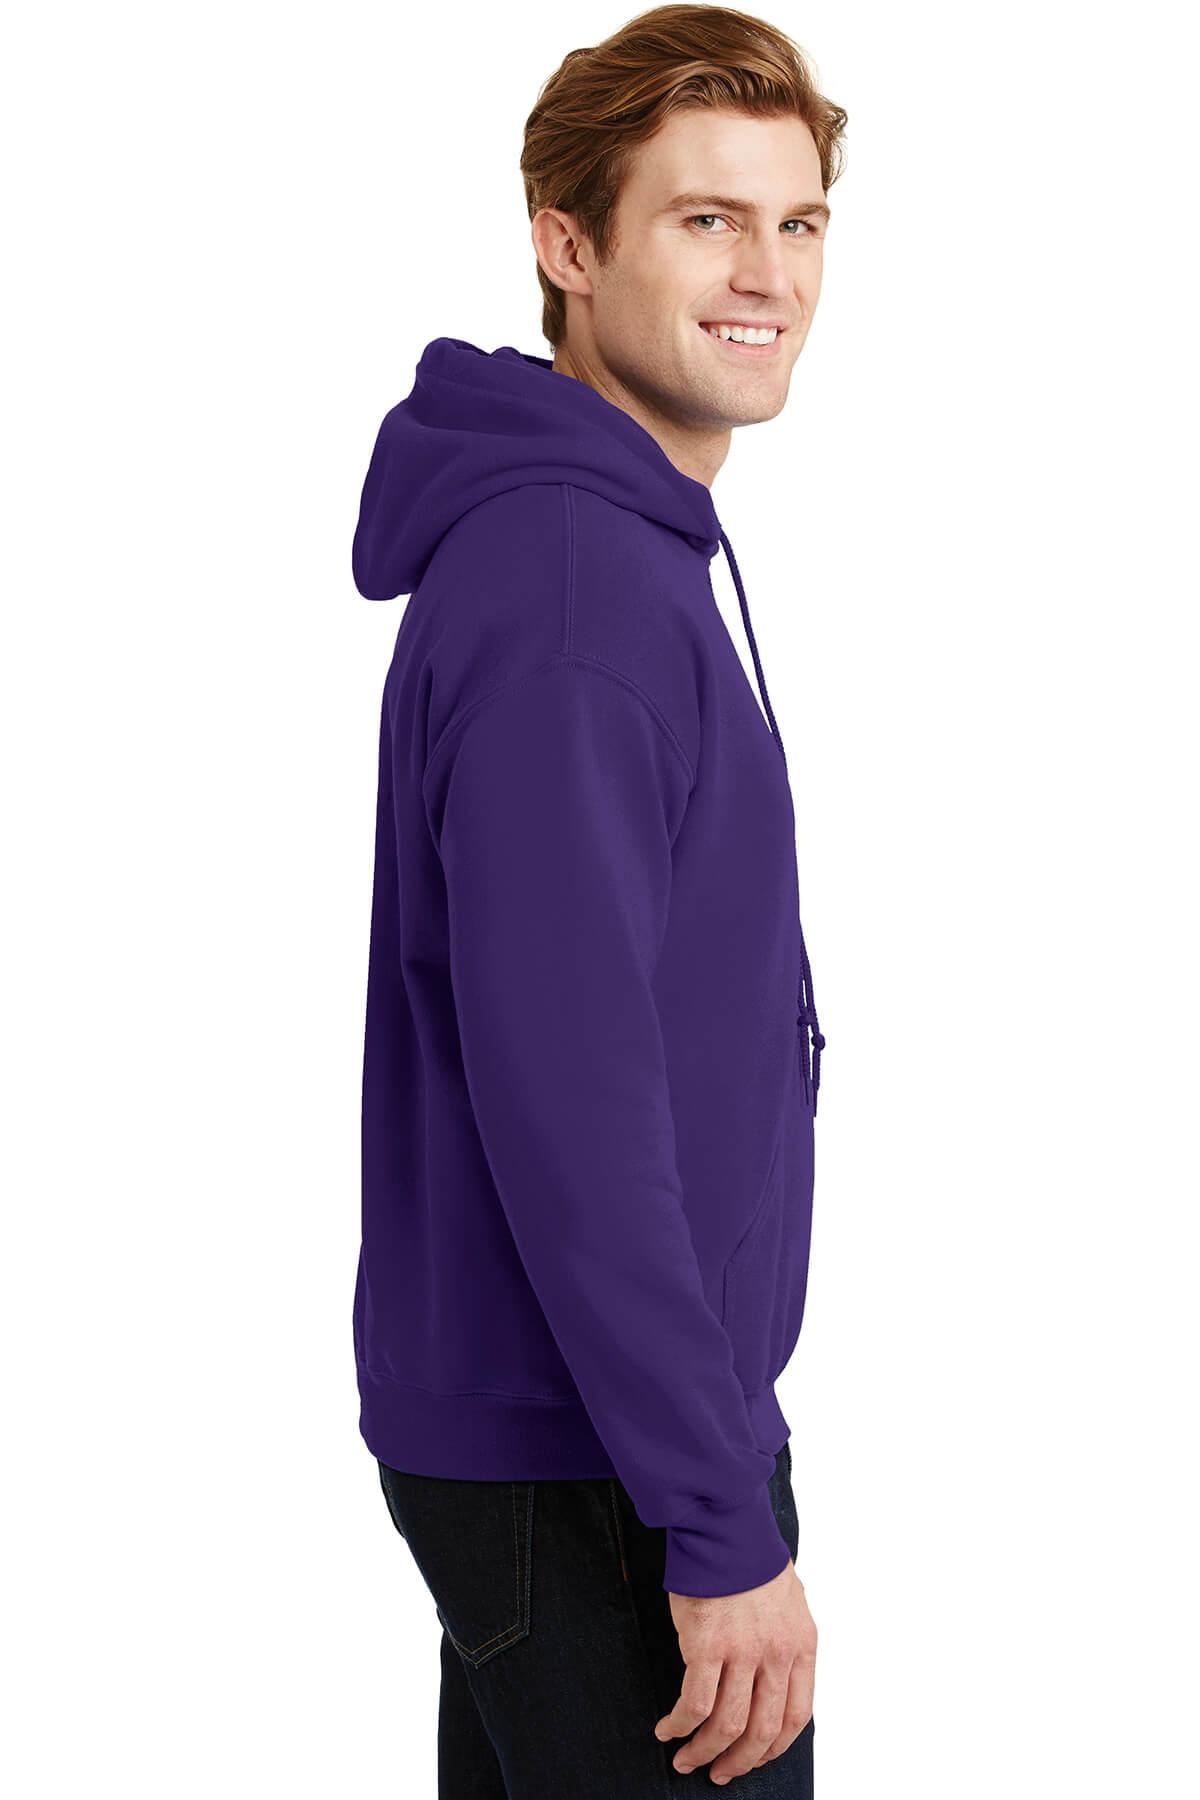 18500-purple-3